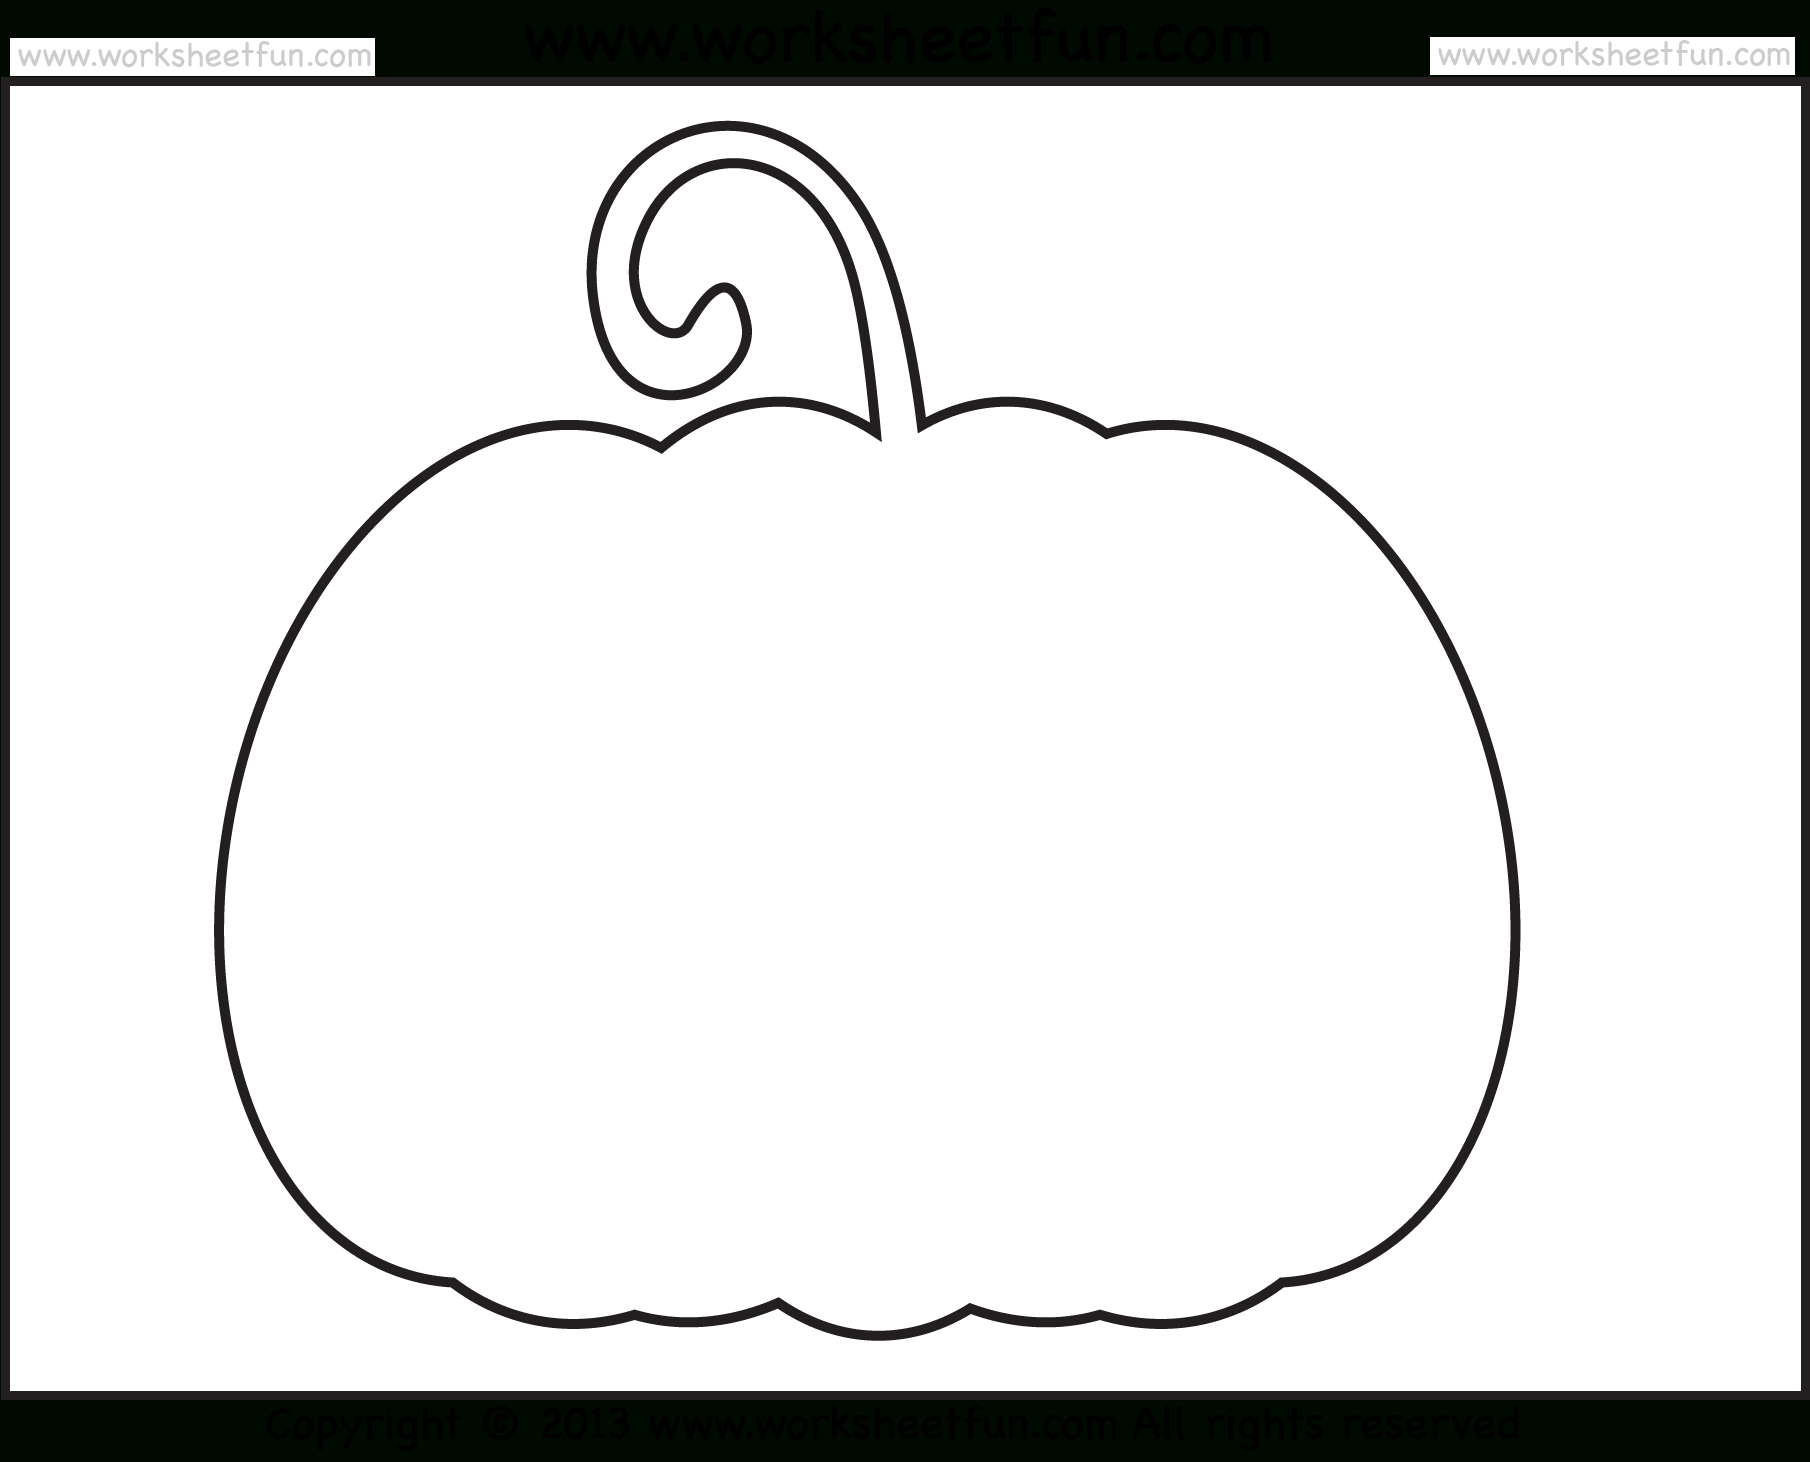 Free Halloween Stencils For Pumpkin … | Pumpkin | Hallo… - Pumpkin Templates Free Printable